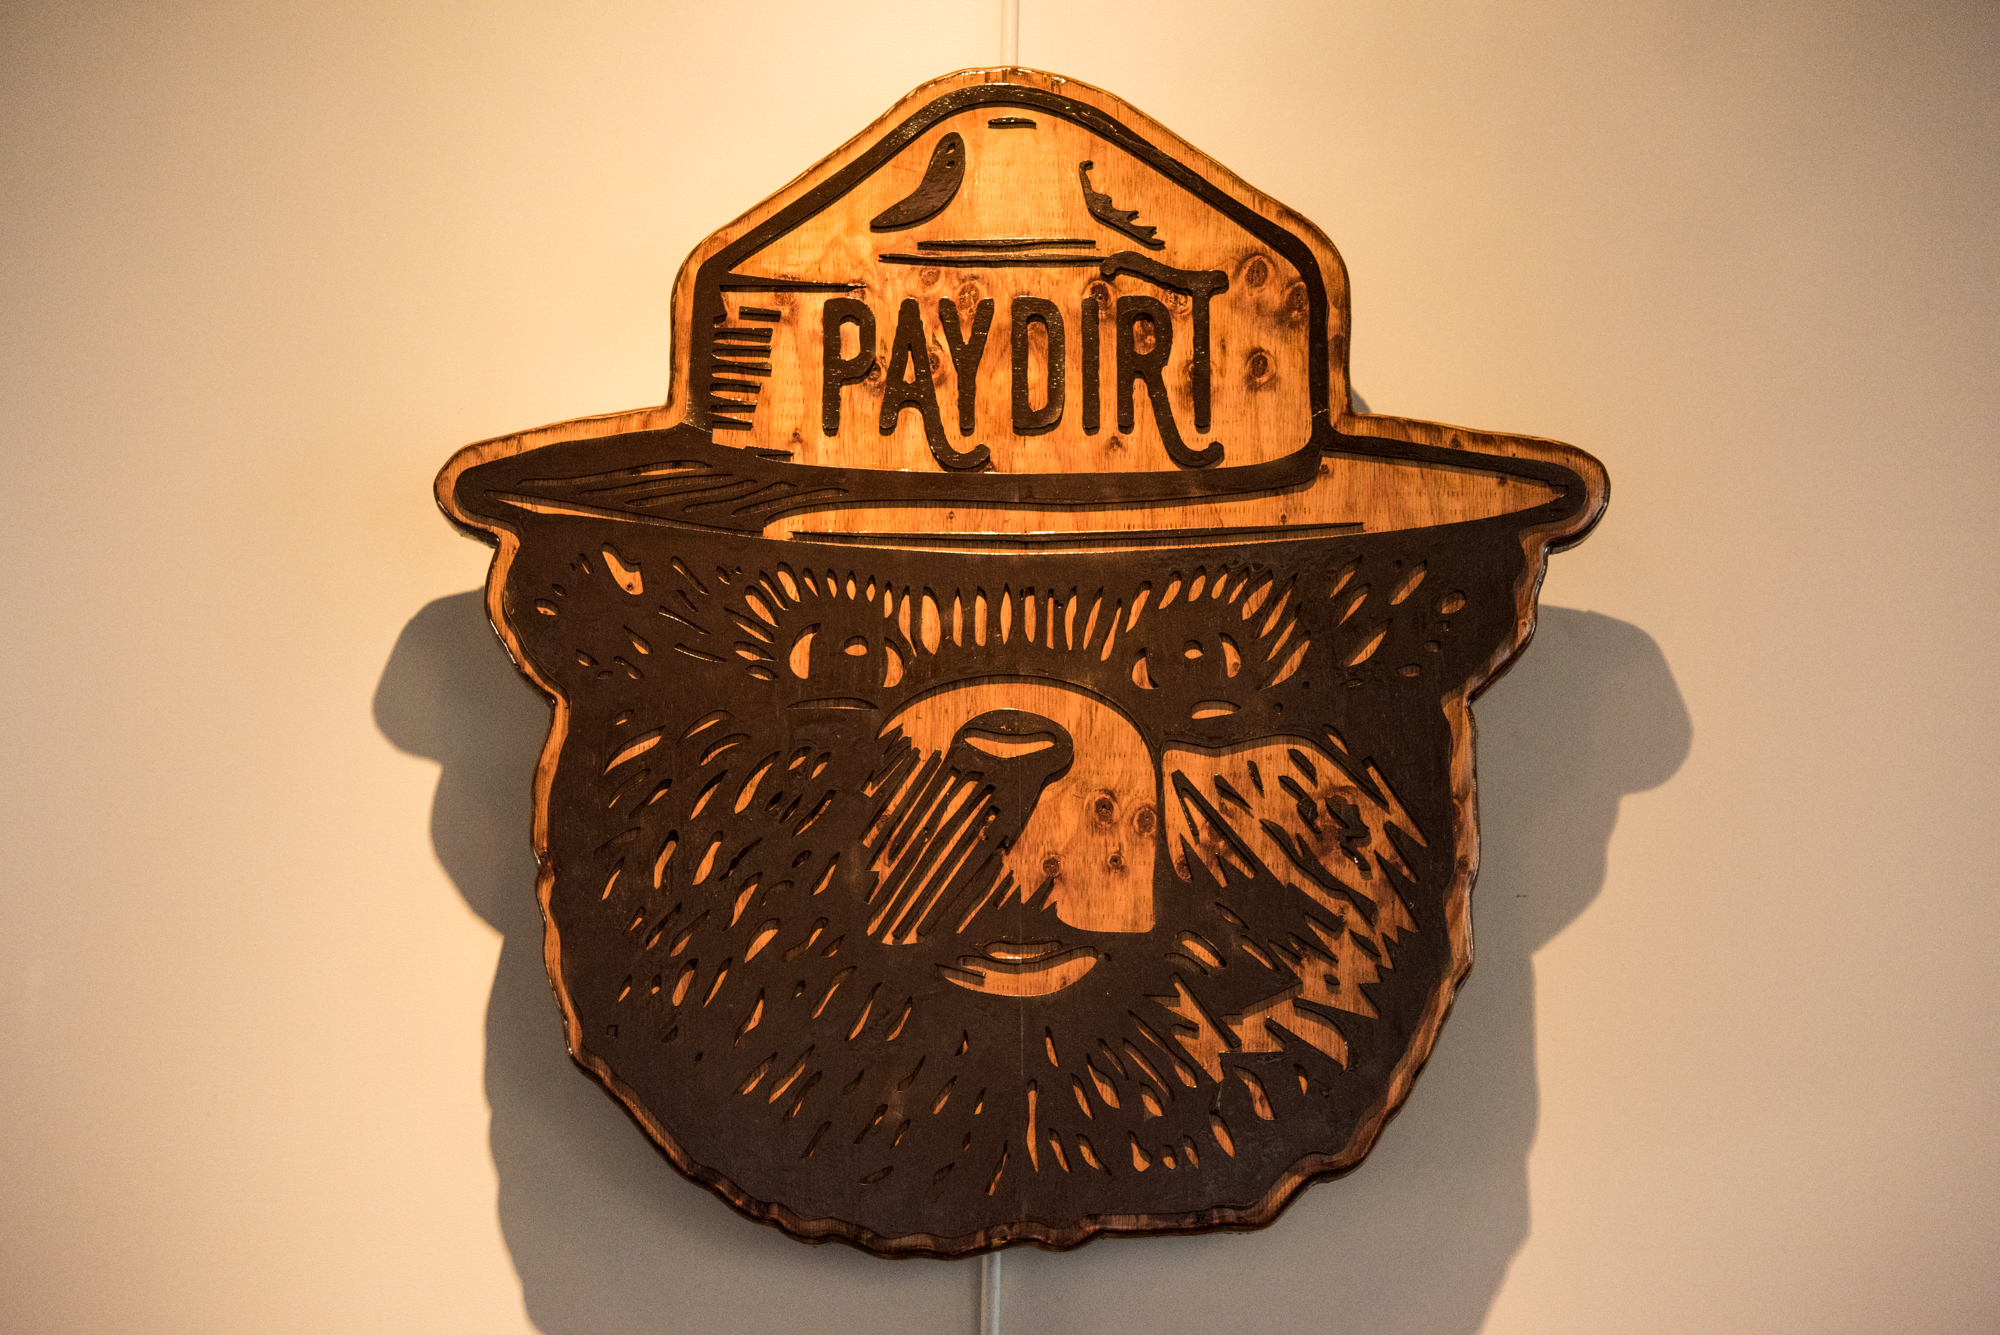 Paydirt Bar